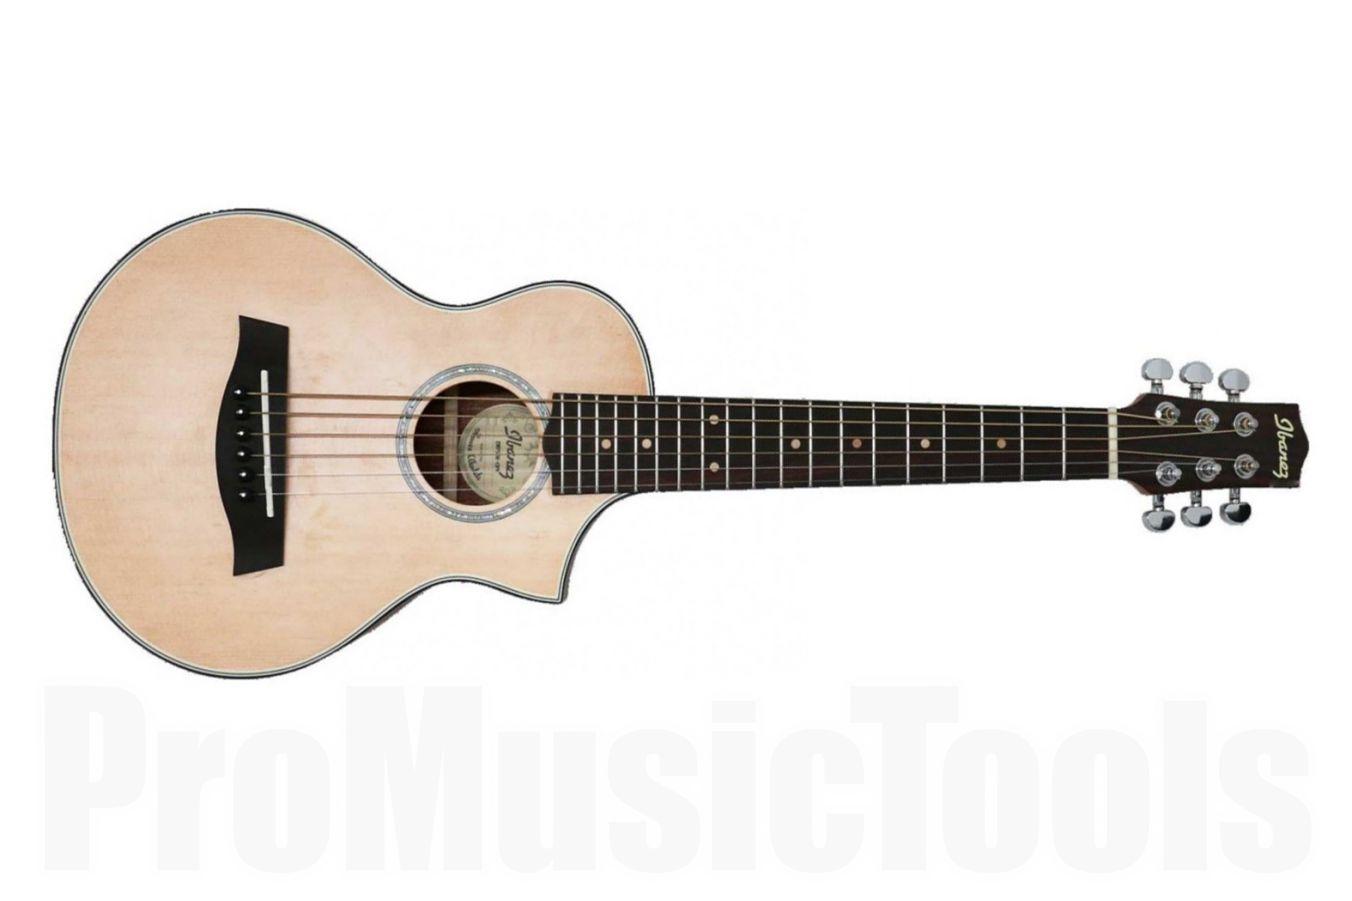 Ibanez EWP15LTD OPN Piccolo Guitar - Open Pore Natural - Limited Edition